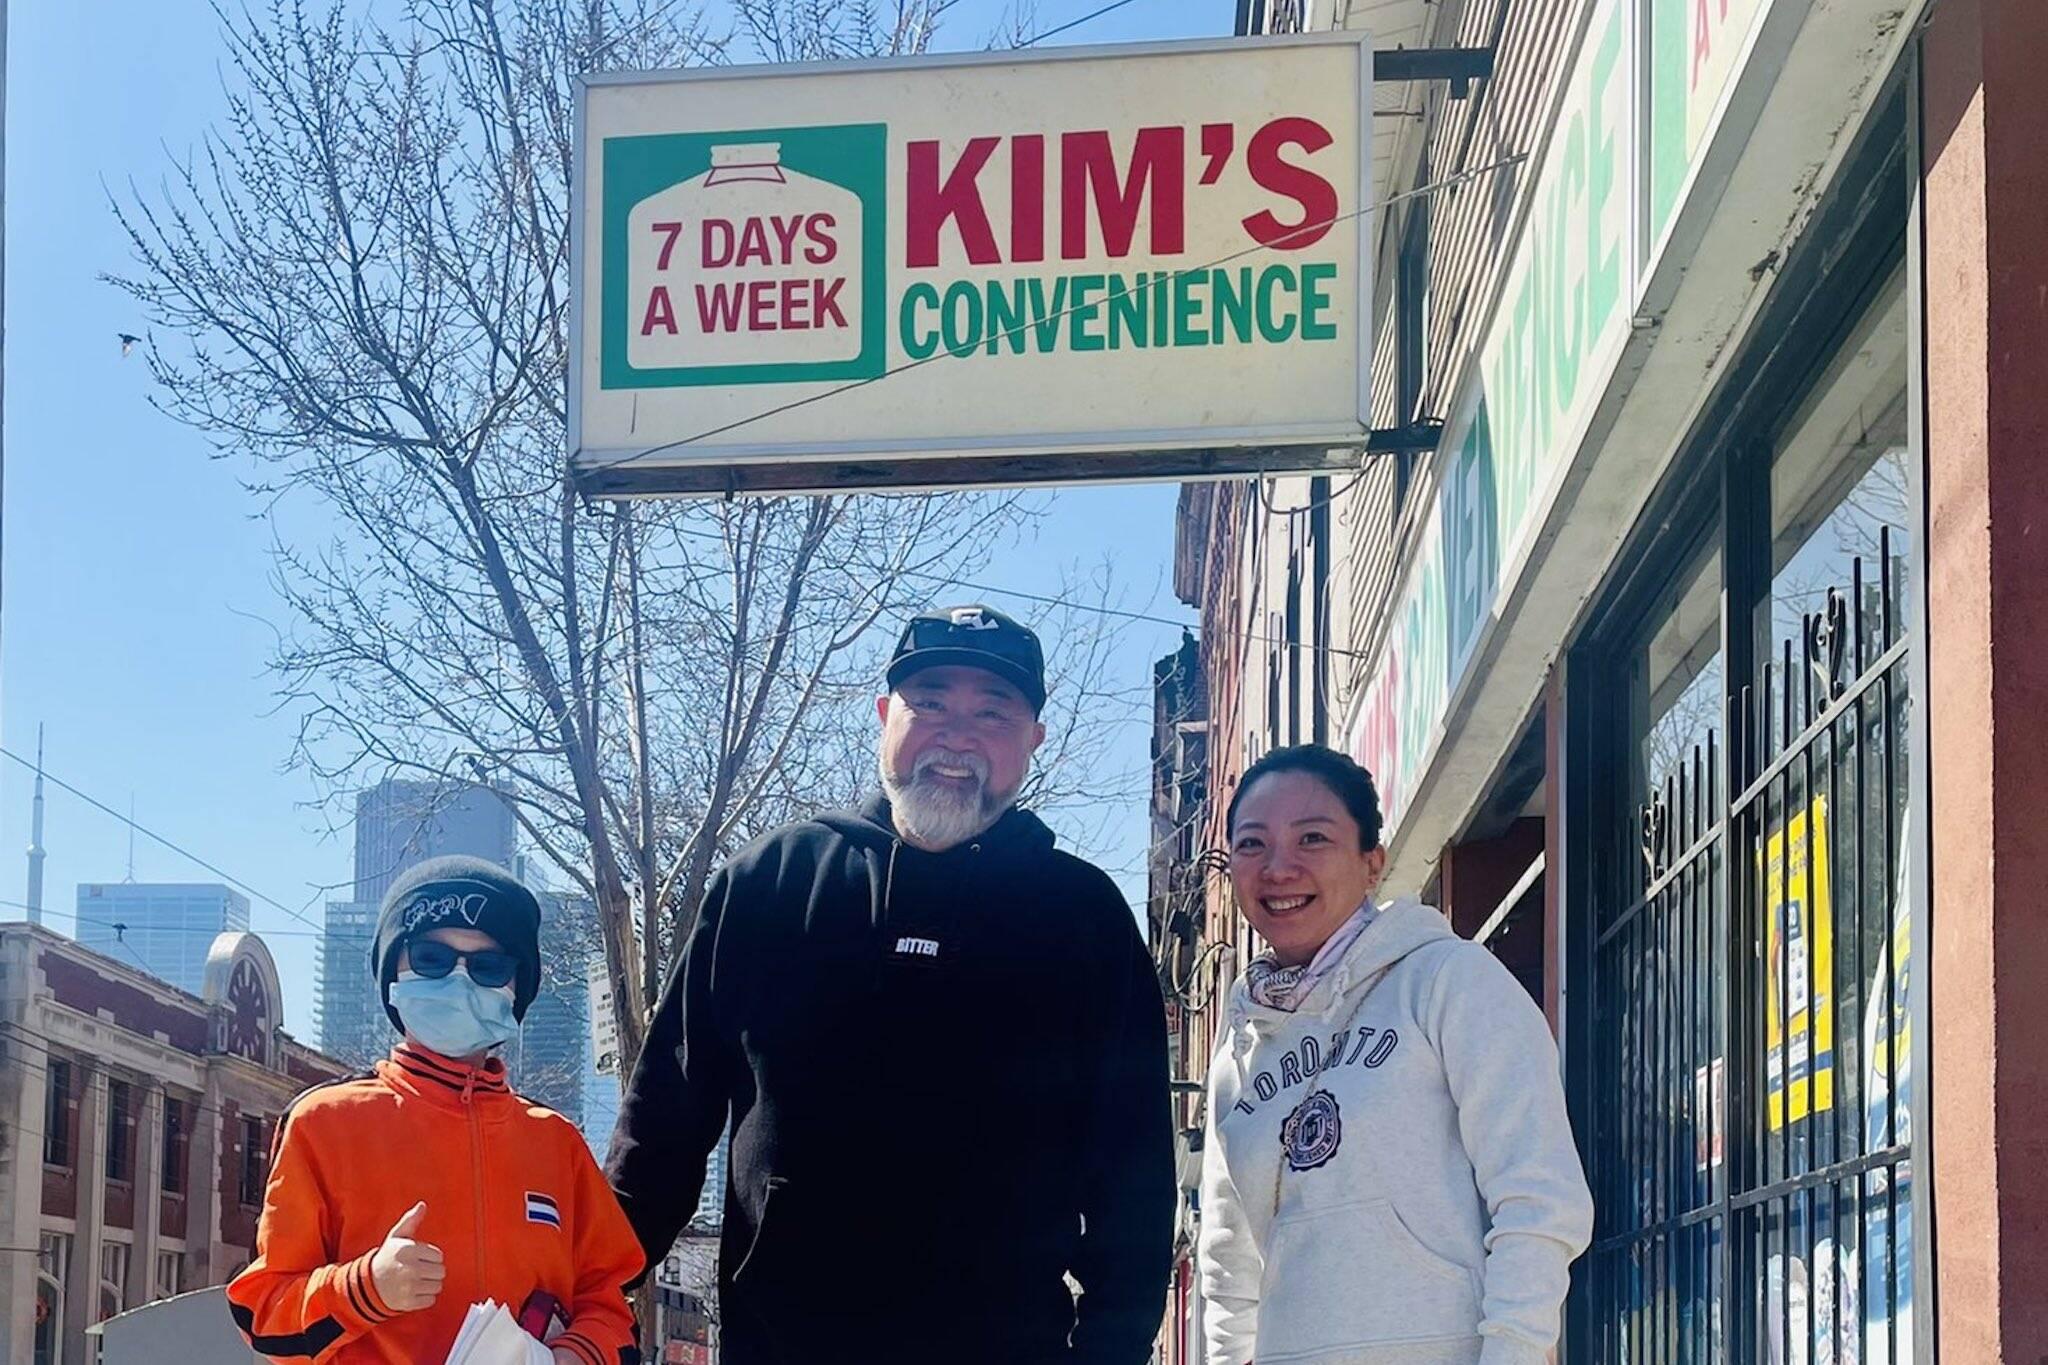 kims convenience location